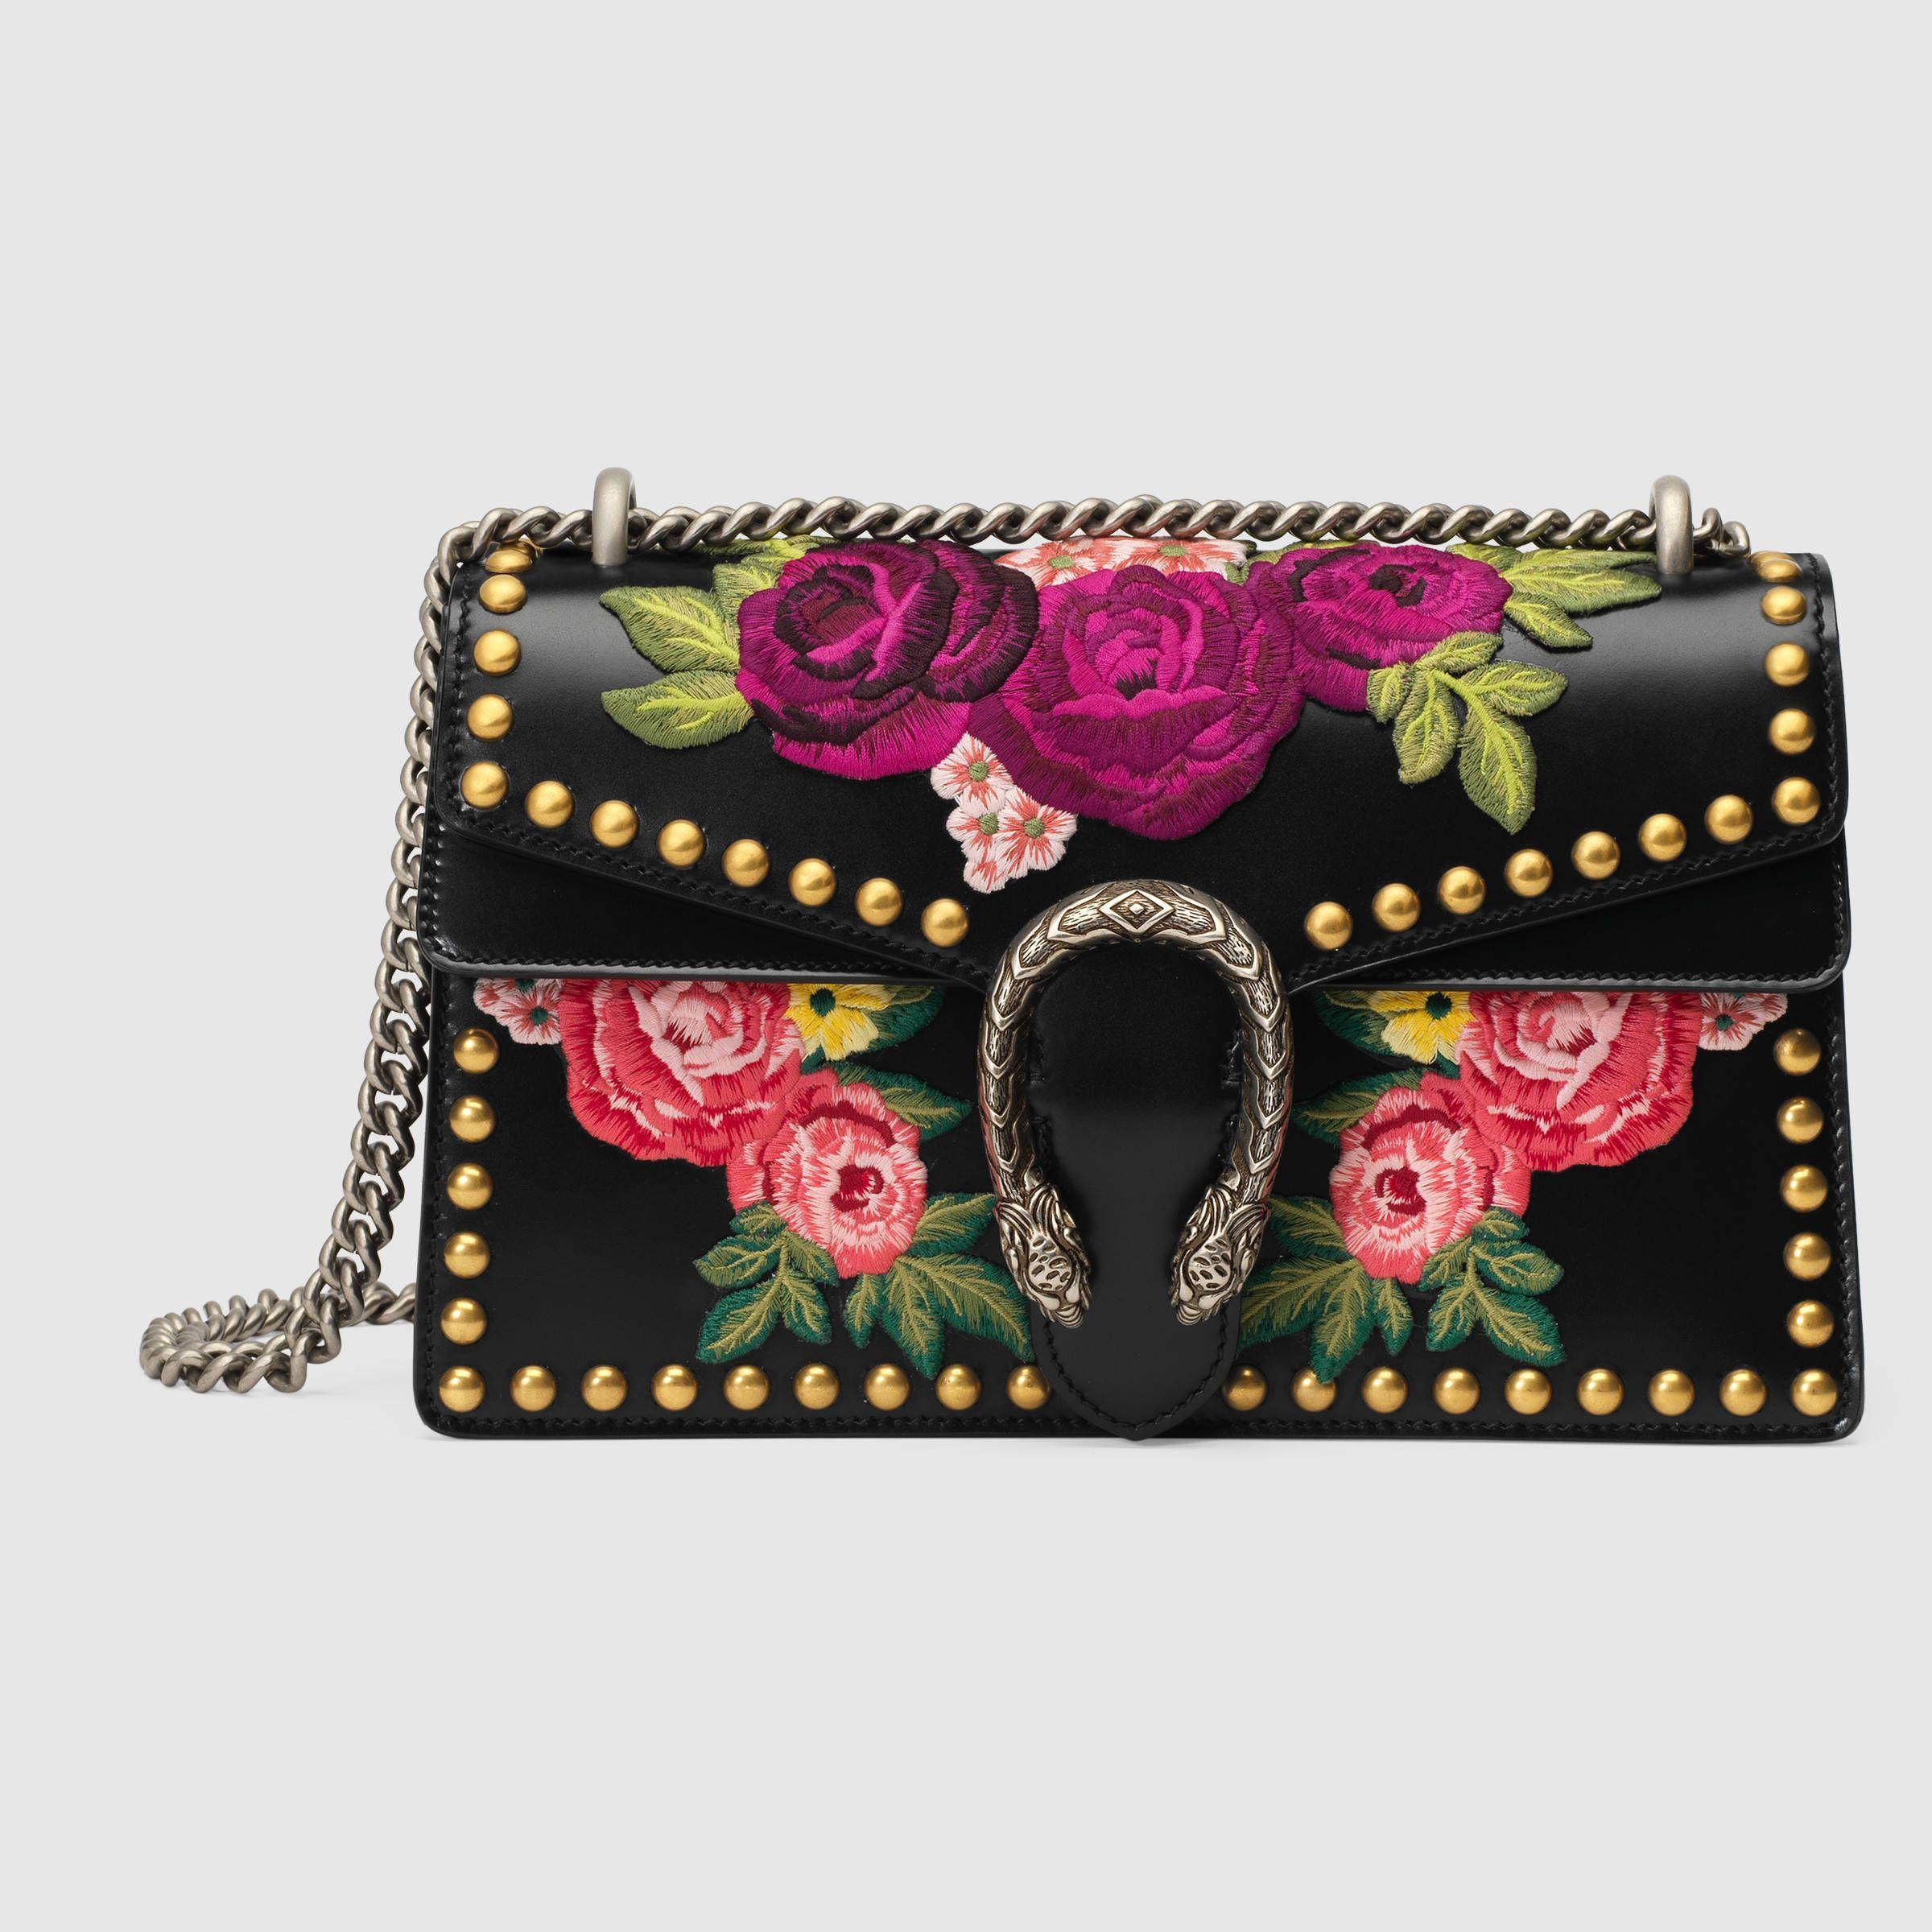 Dionysus embroidered leather shoulder bag Gucci 6xNJh